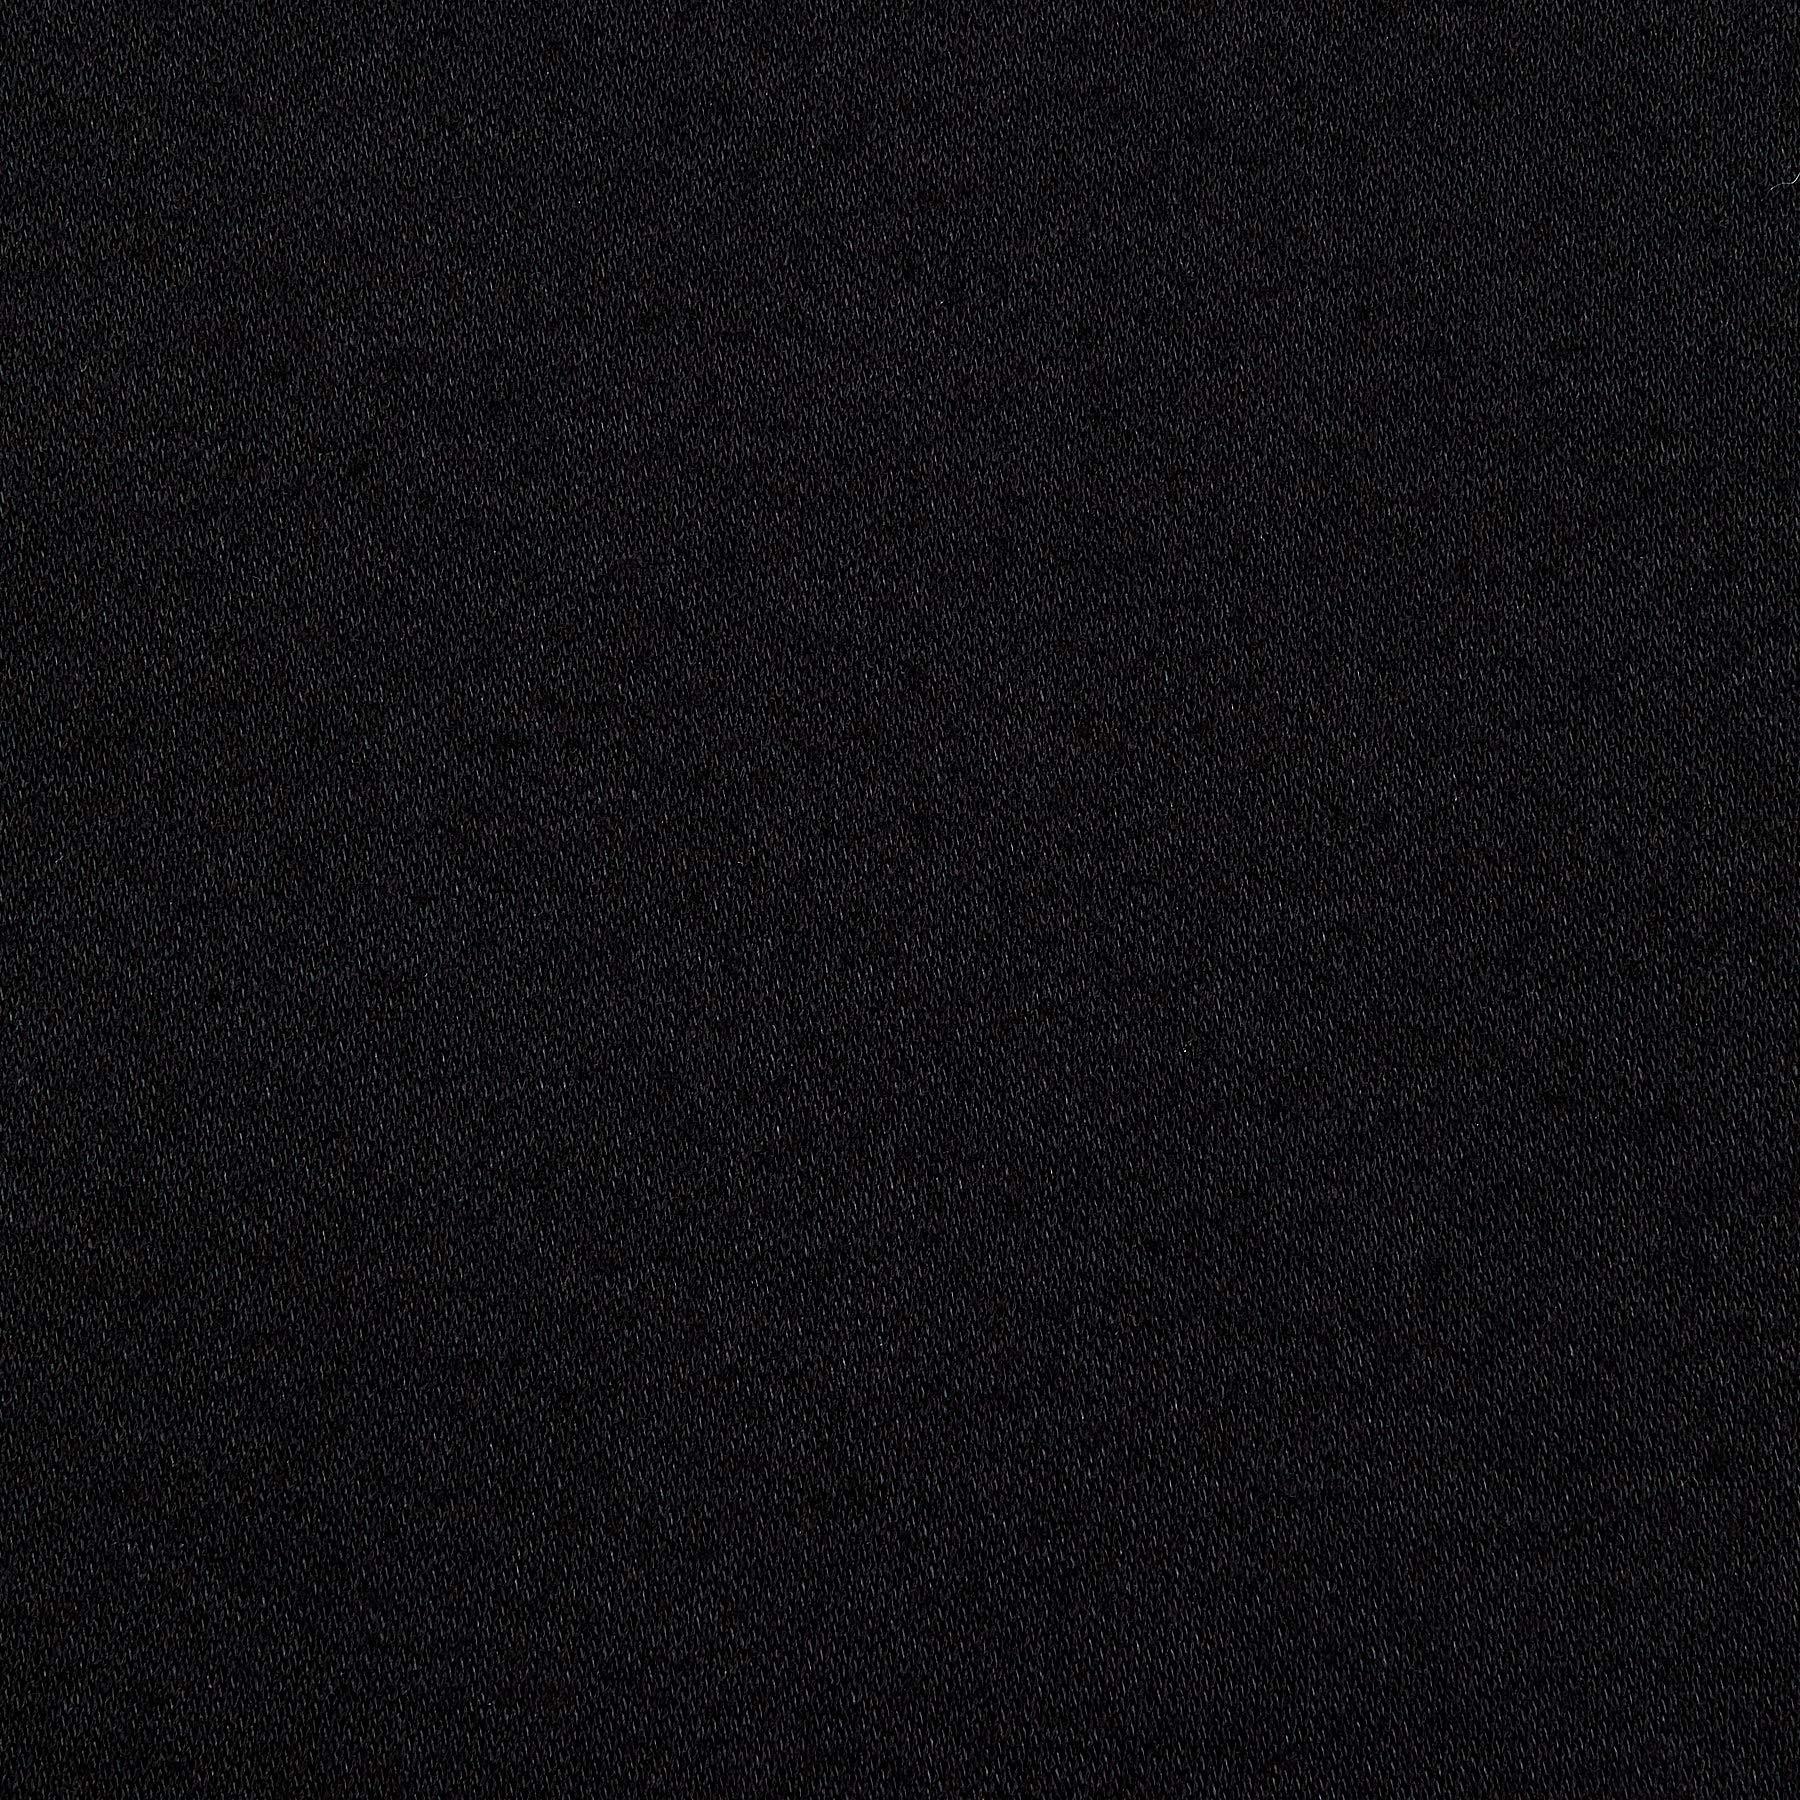 Richland Textiles Interlock Knit Black Fabric By The Yard